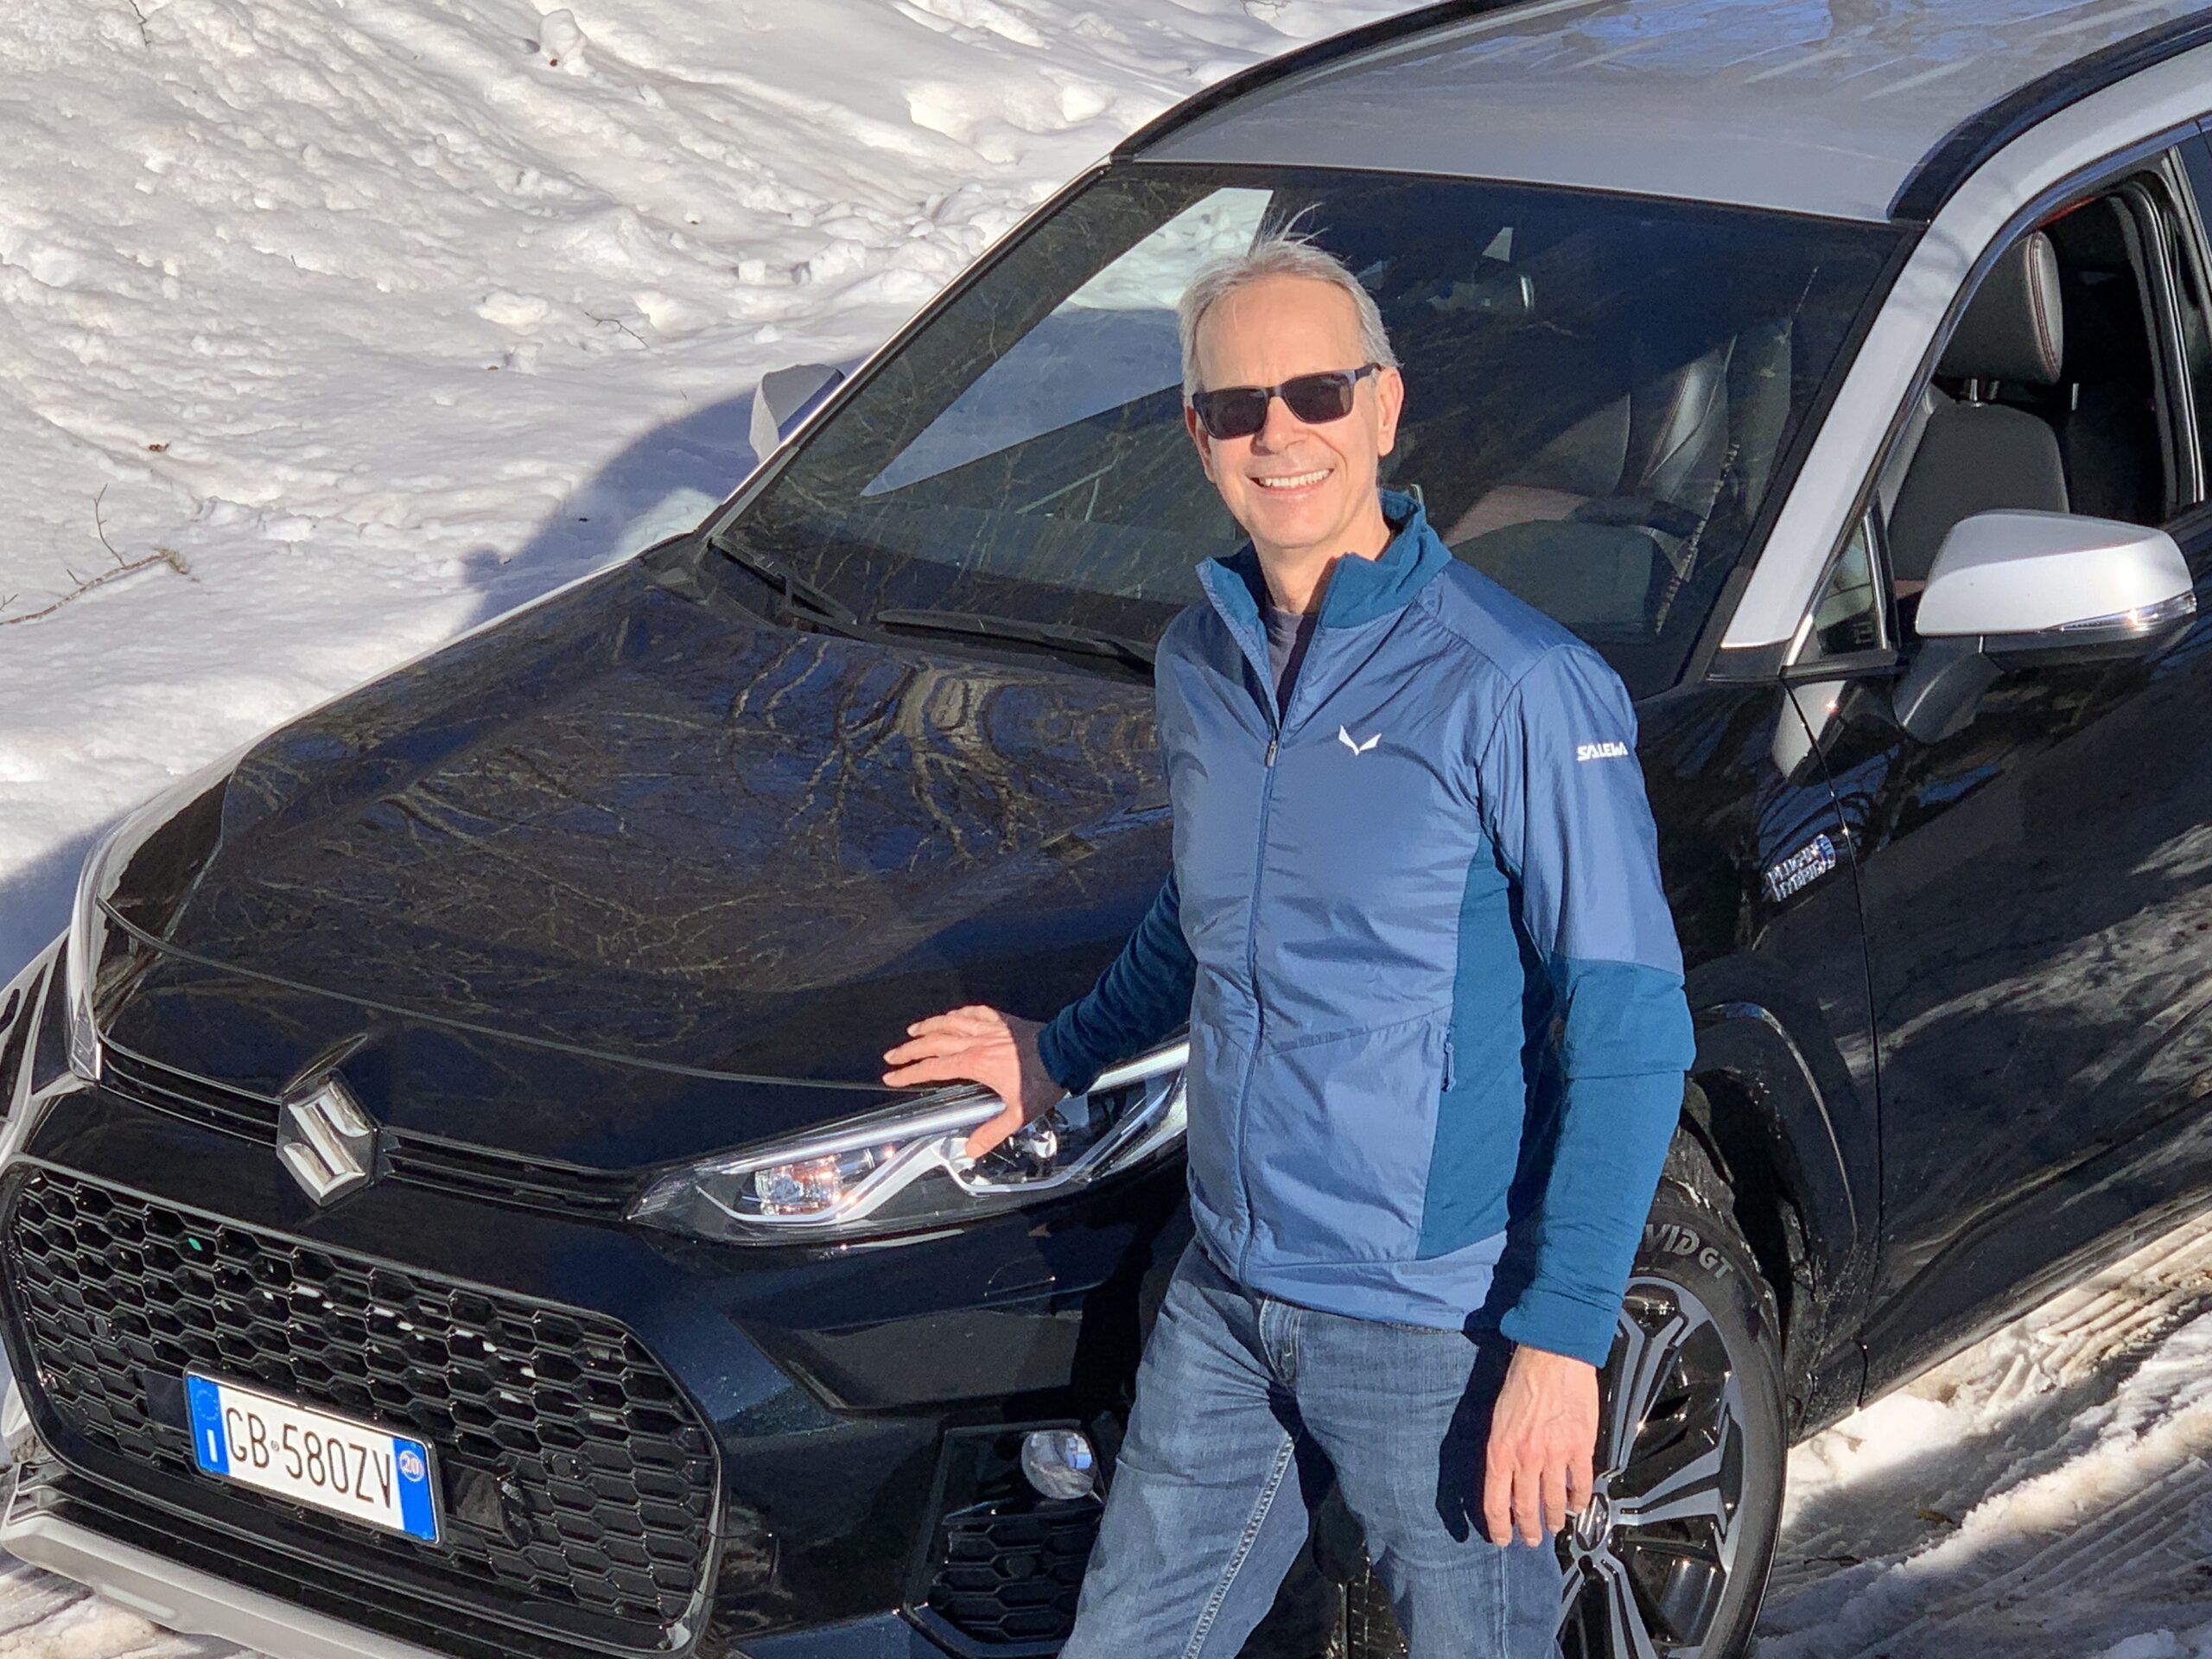 Suzuki Across Plug-in Hybrid, la mia prova estrema sulla neve